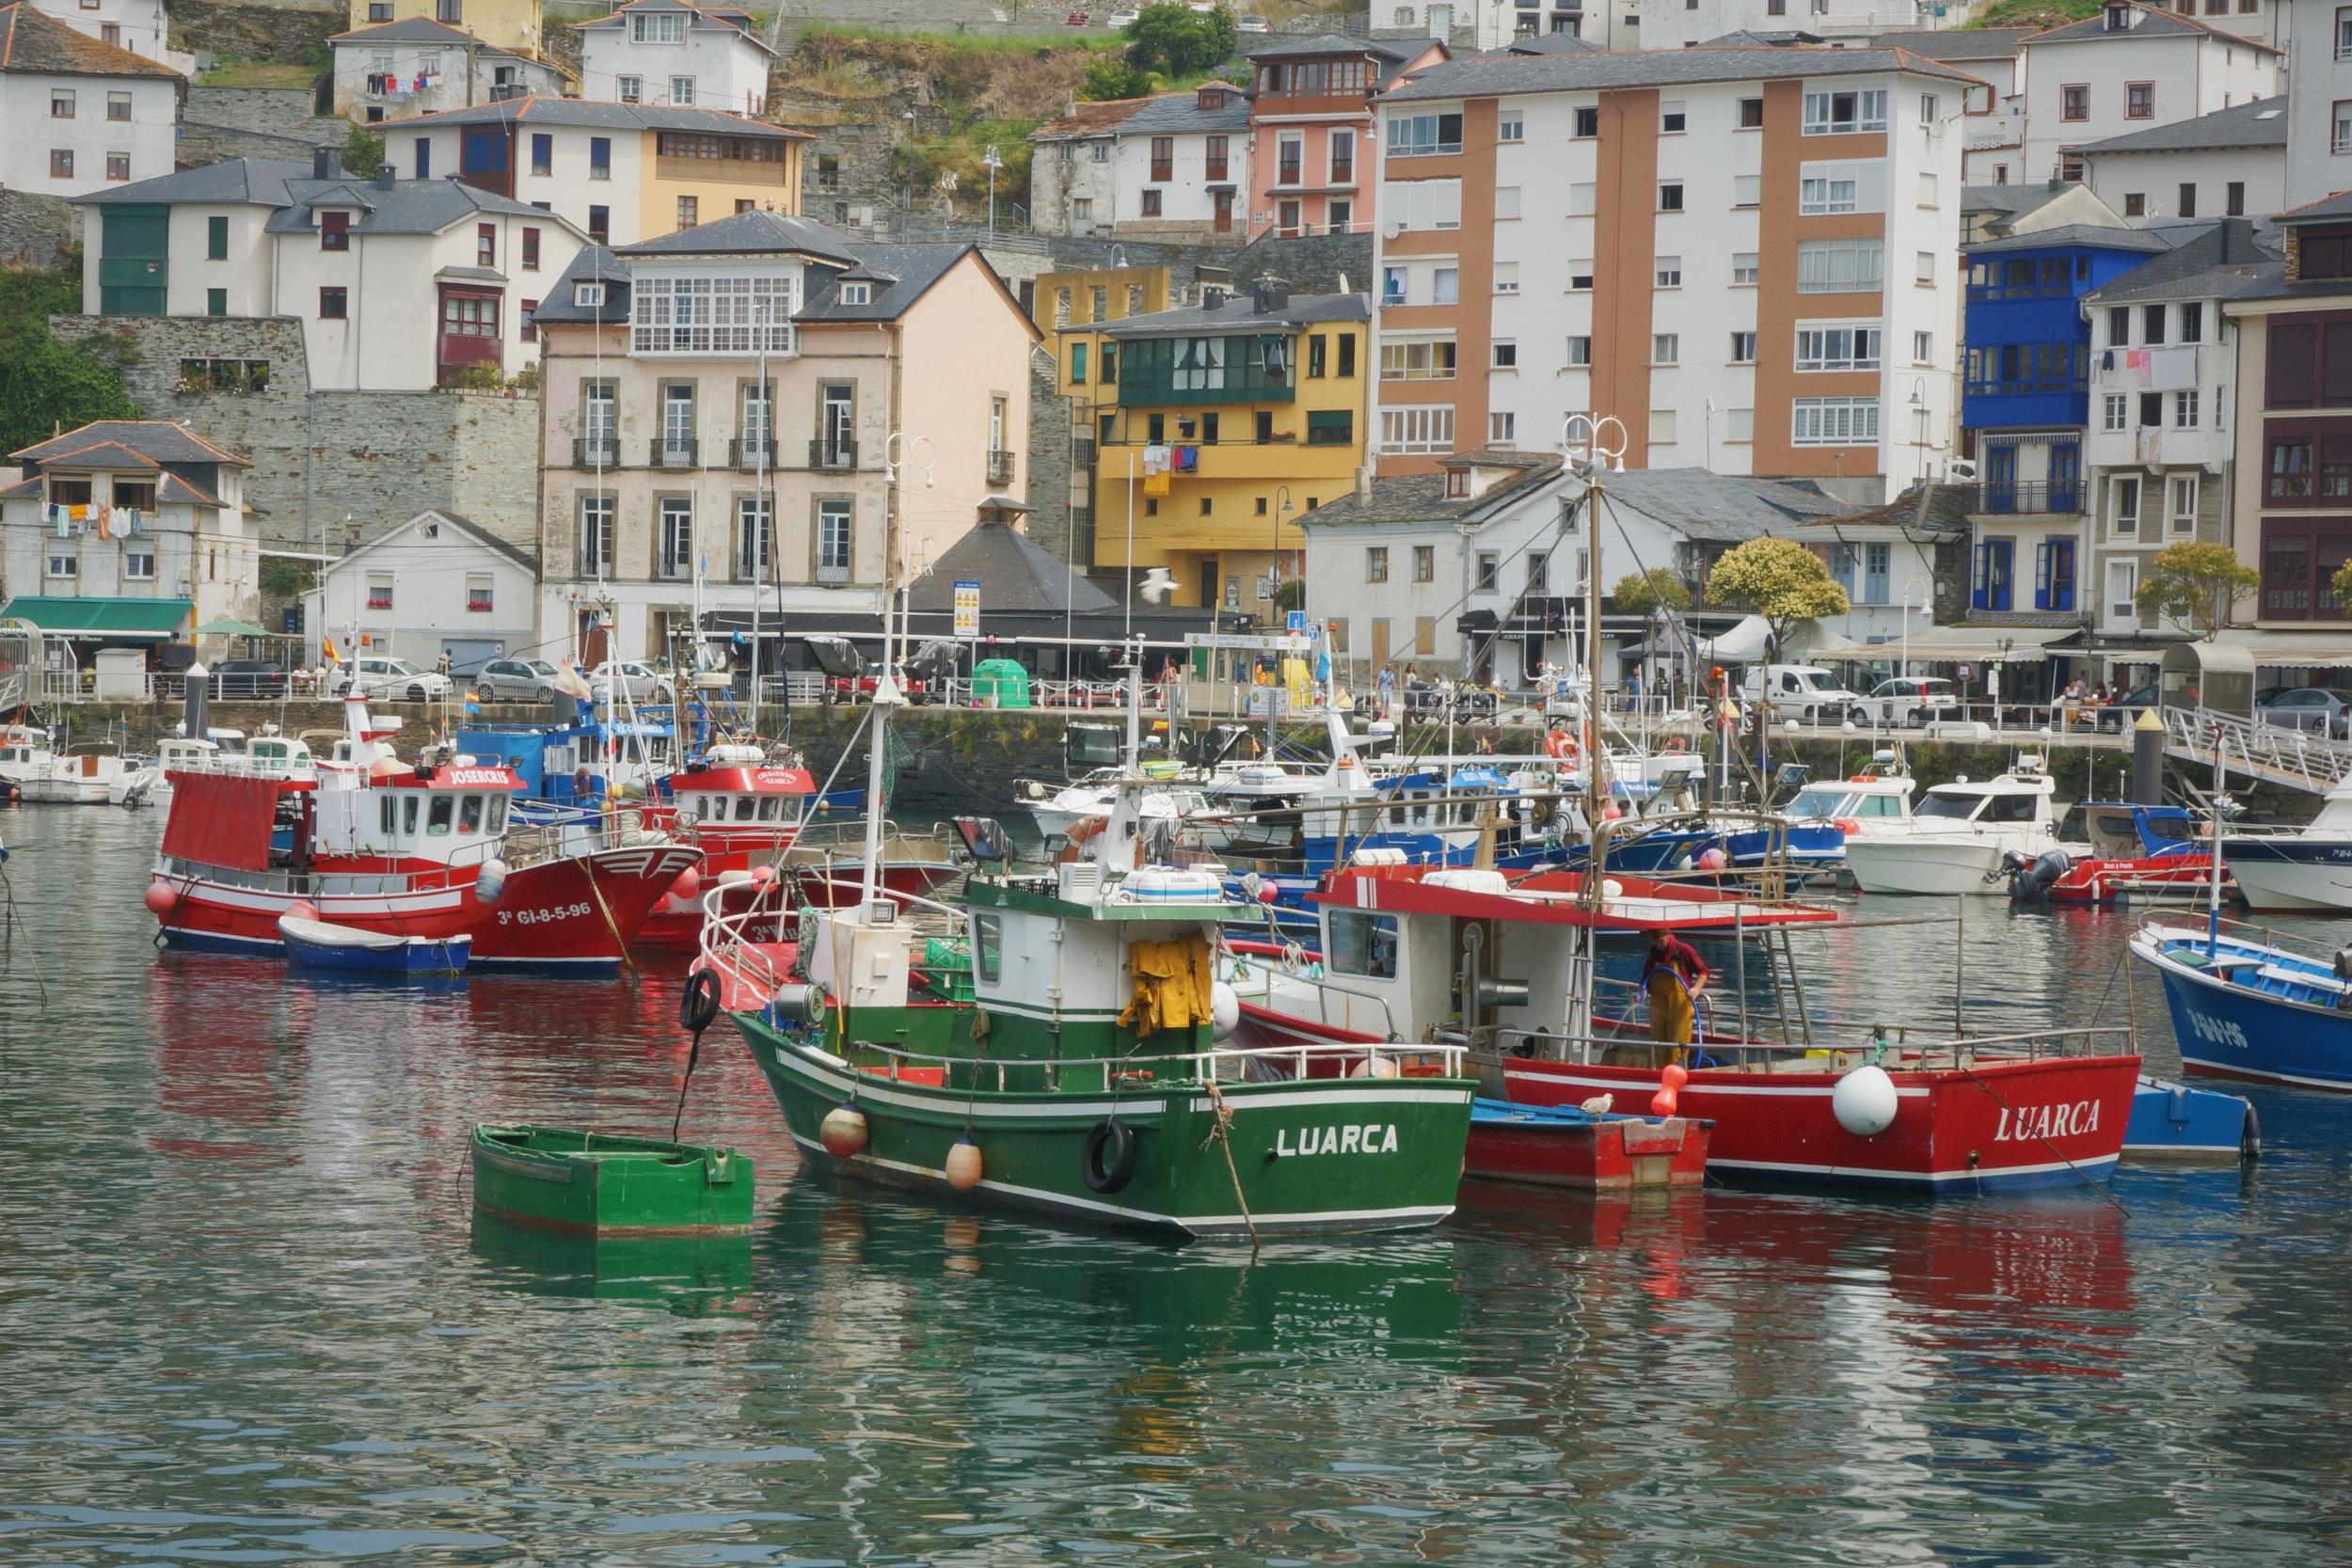 Luarca is a small fishermen's village in Asturias.